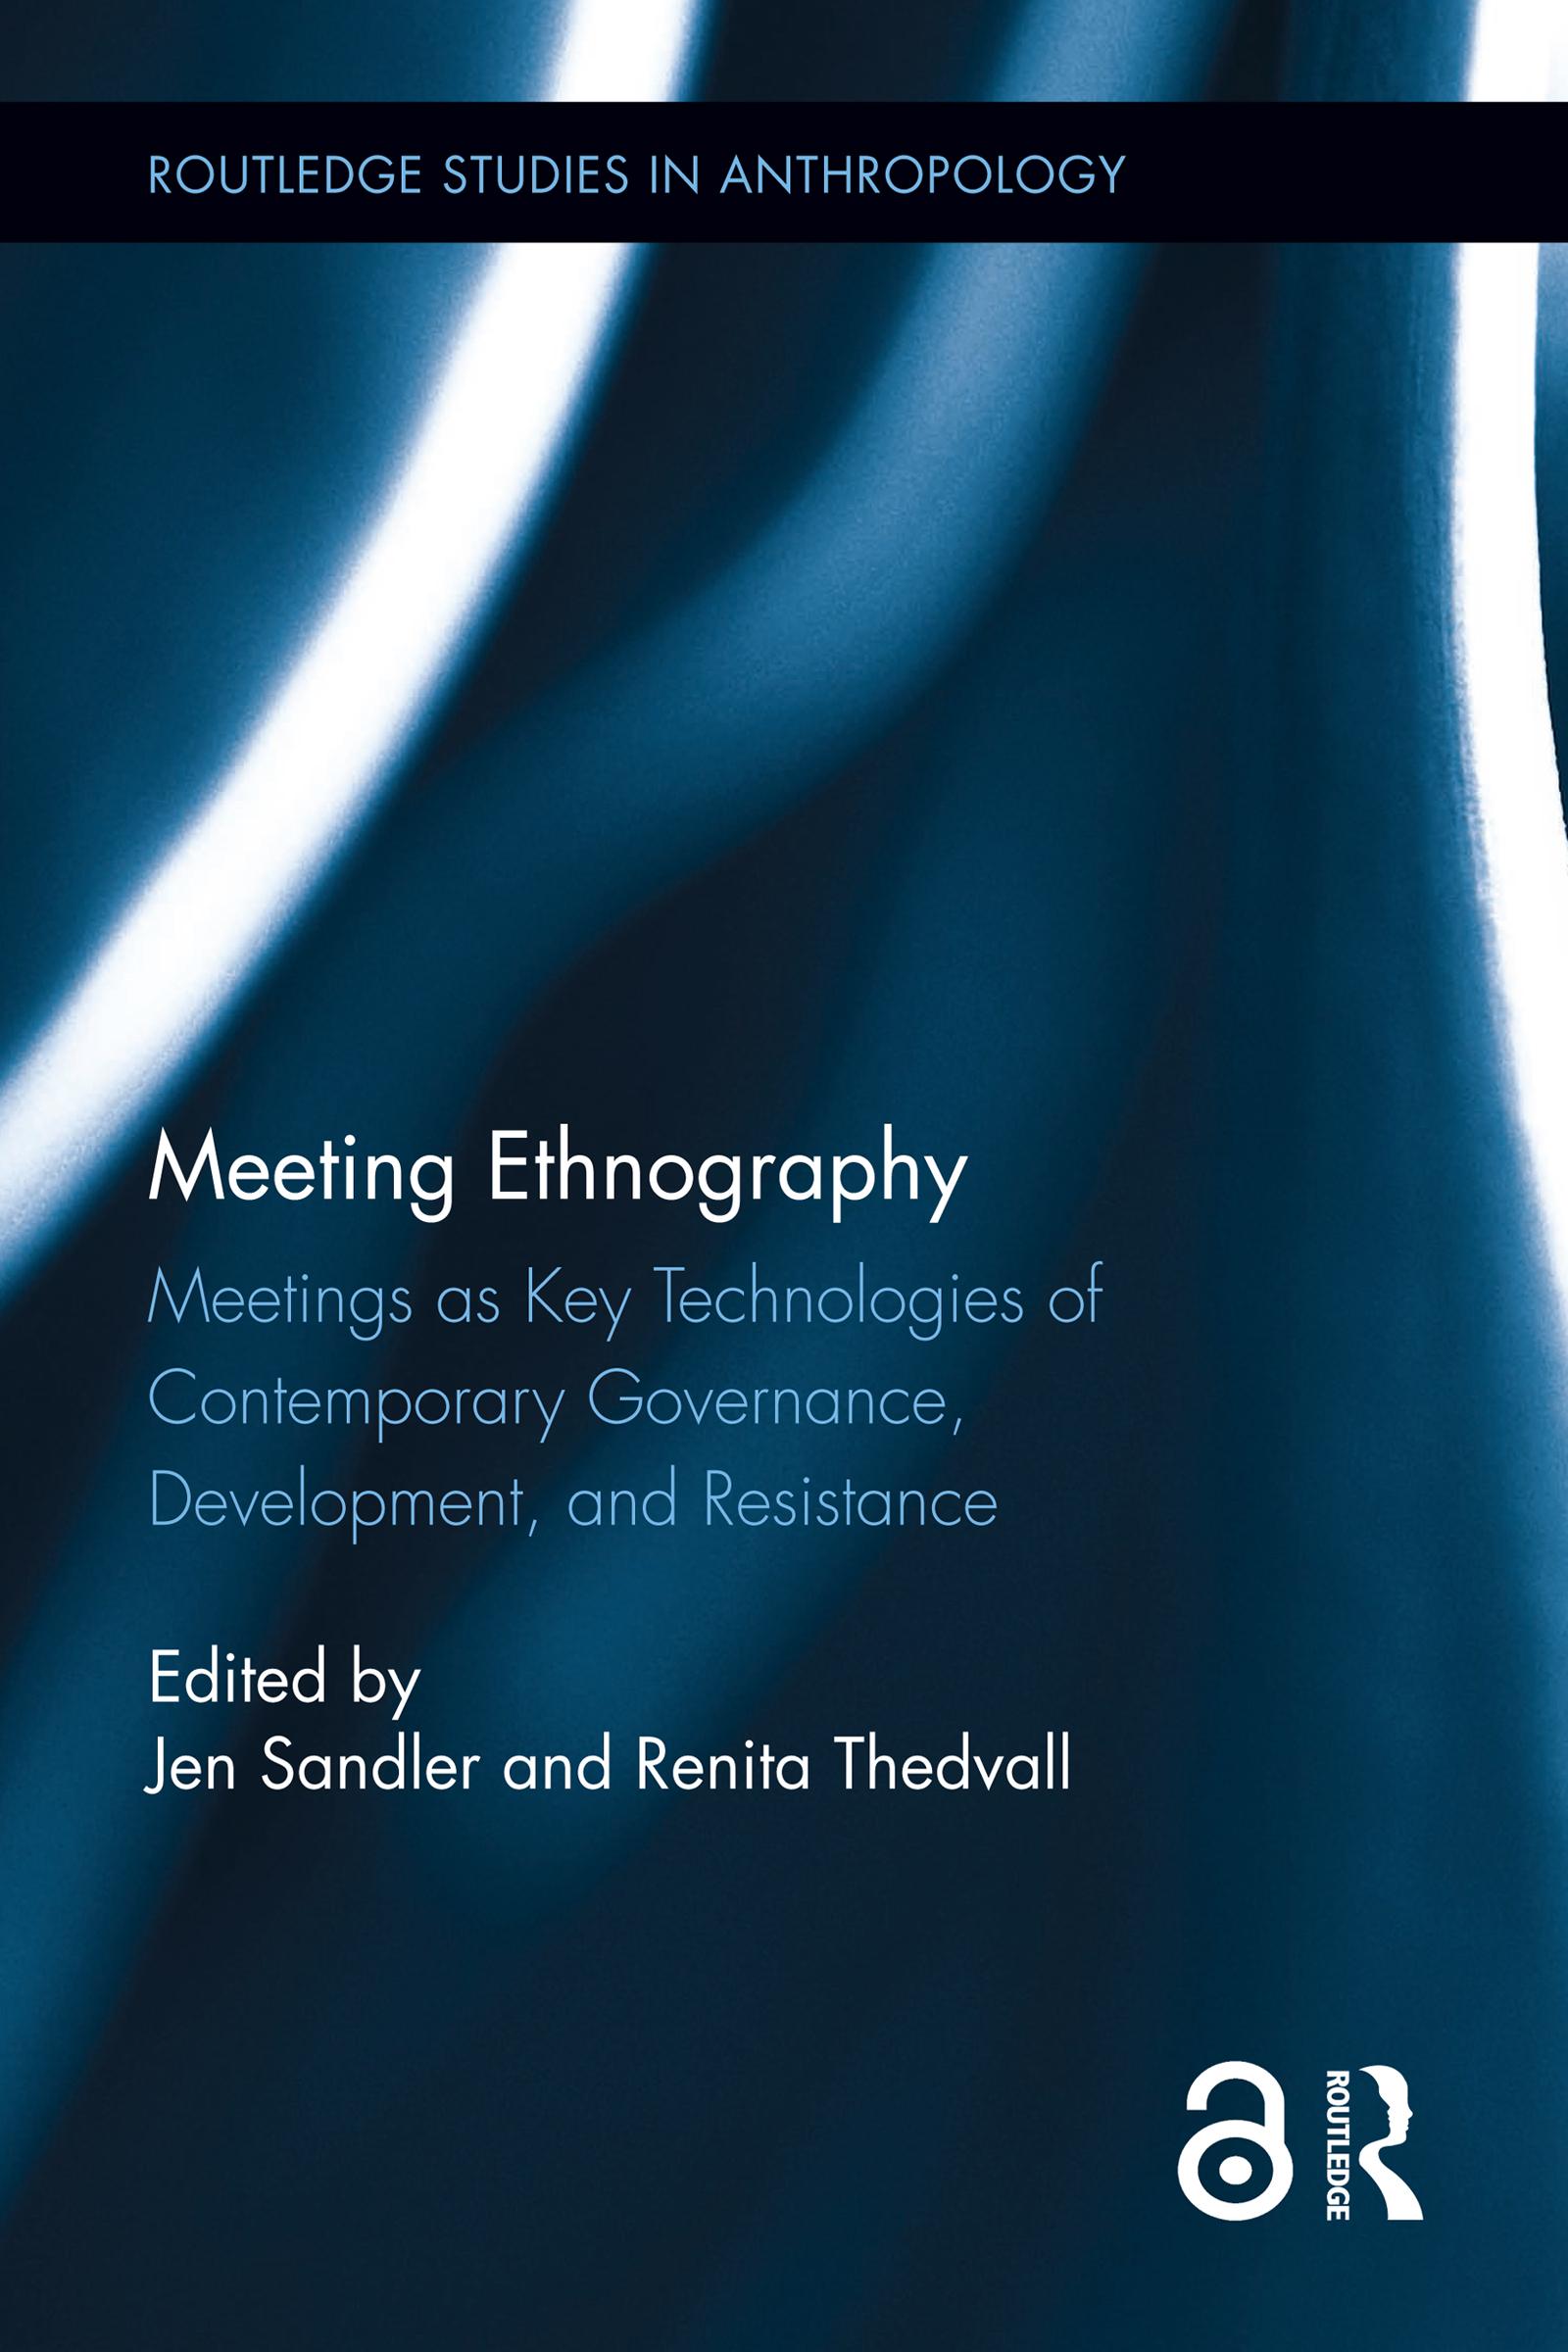 Meeting Ethnography